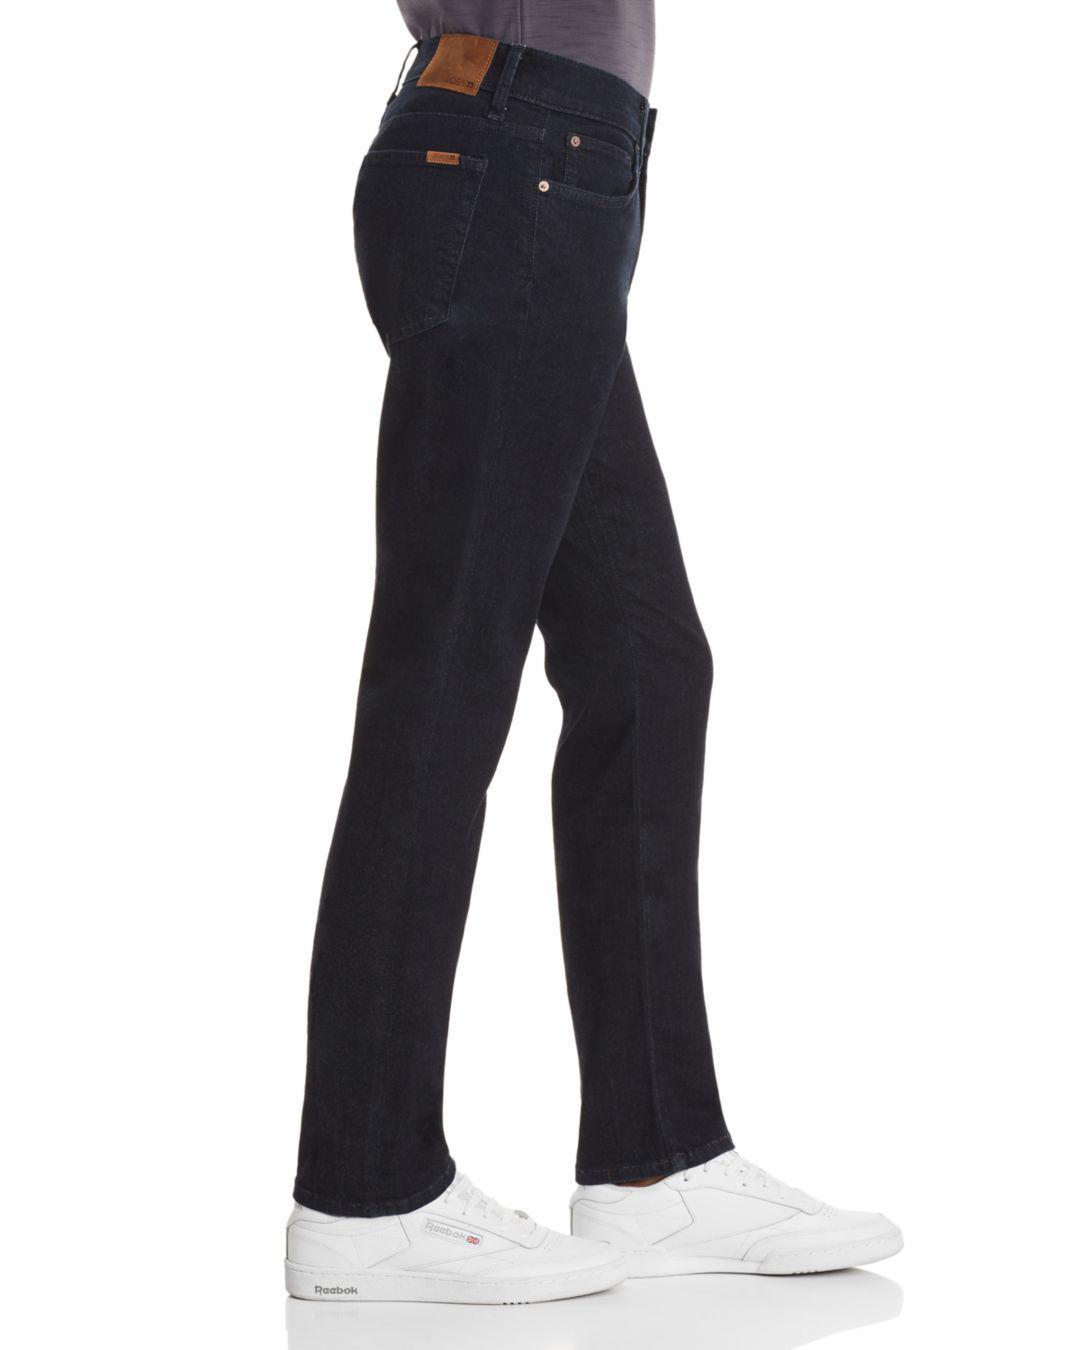 57c40d3d25d Joe's Jeans Brixton Straight Fit Jeans In Dizzy in Blue for Men - Lyst